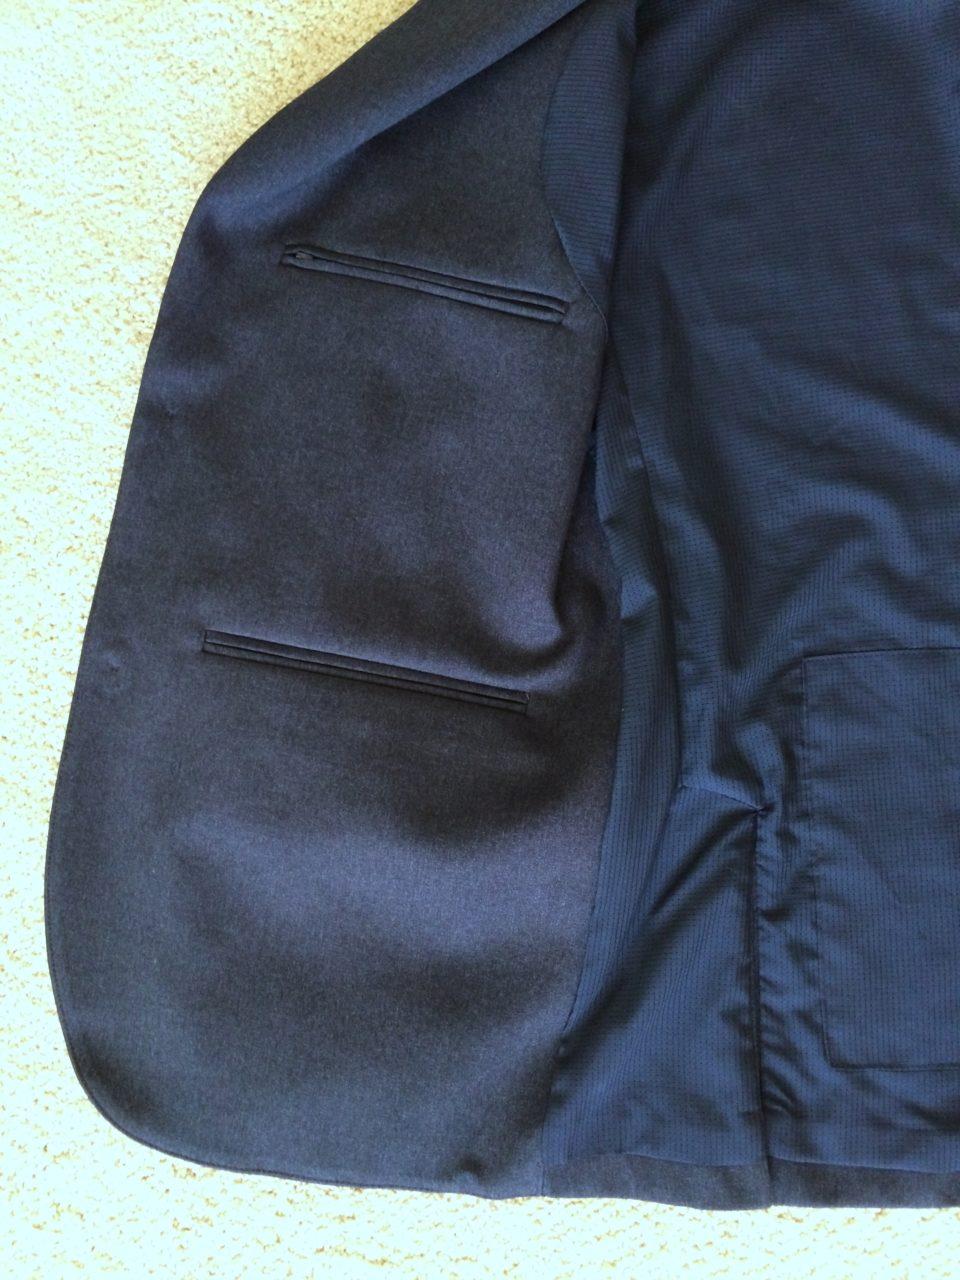 Bluffworks blazer right inner pockets